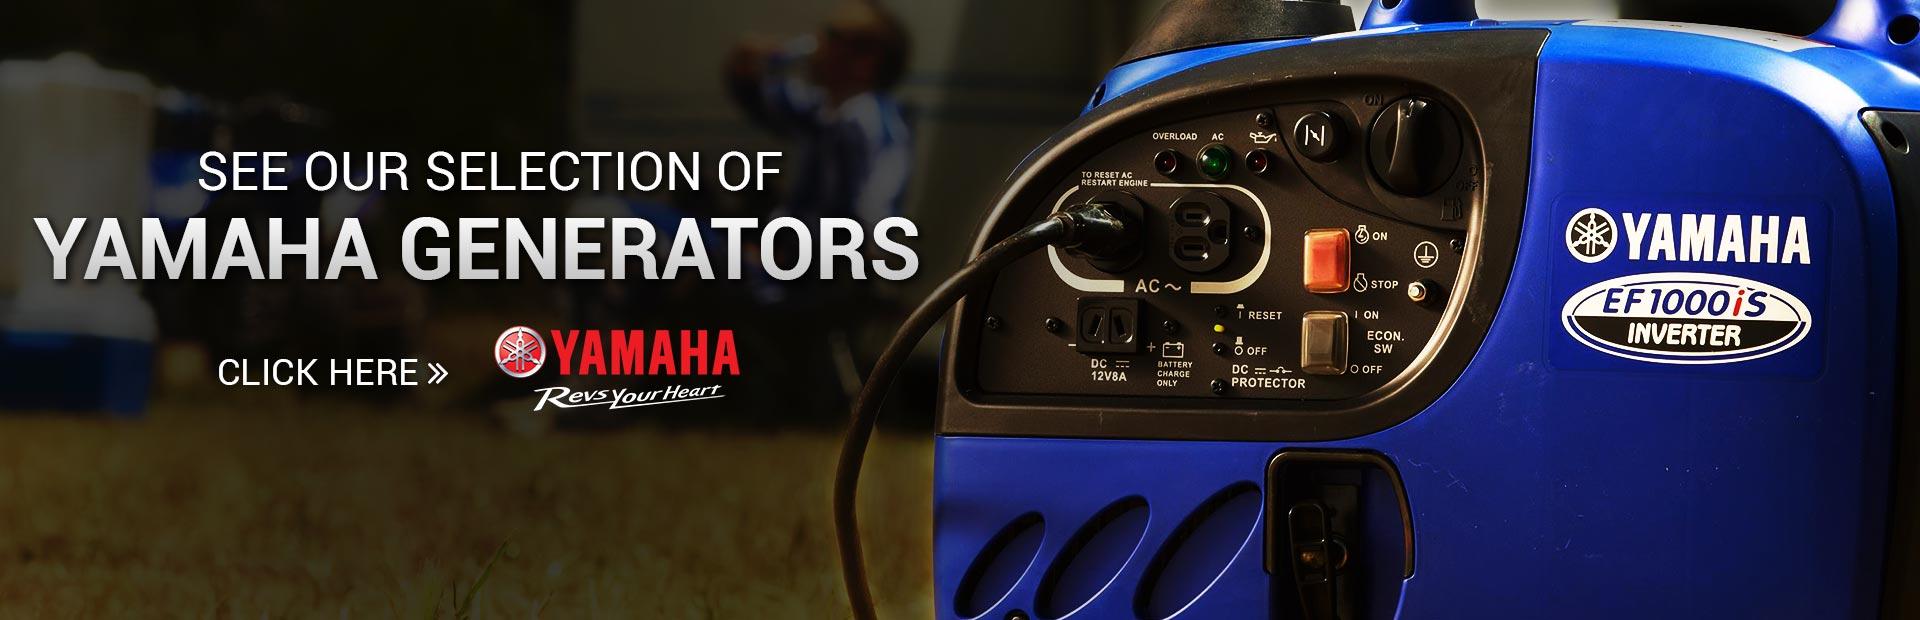 Yamaha of Sylacauga Sylacauga, AL (256) 245-2255